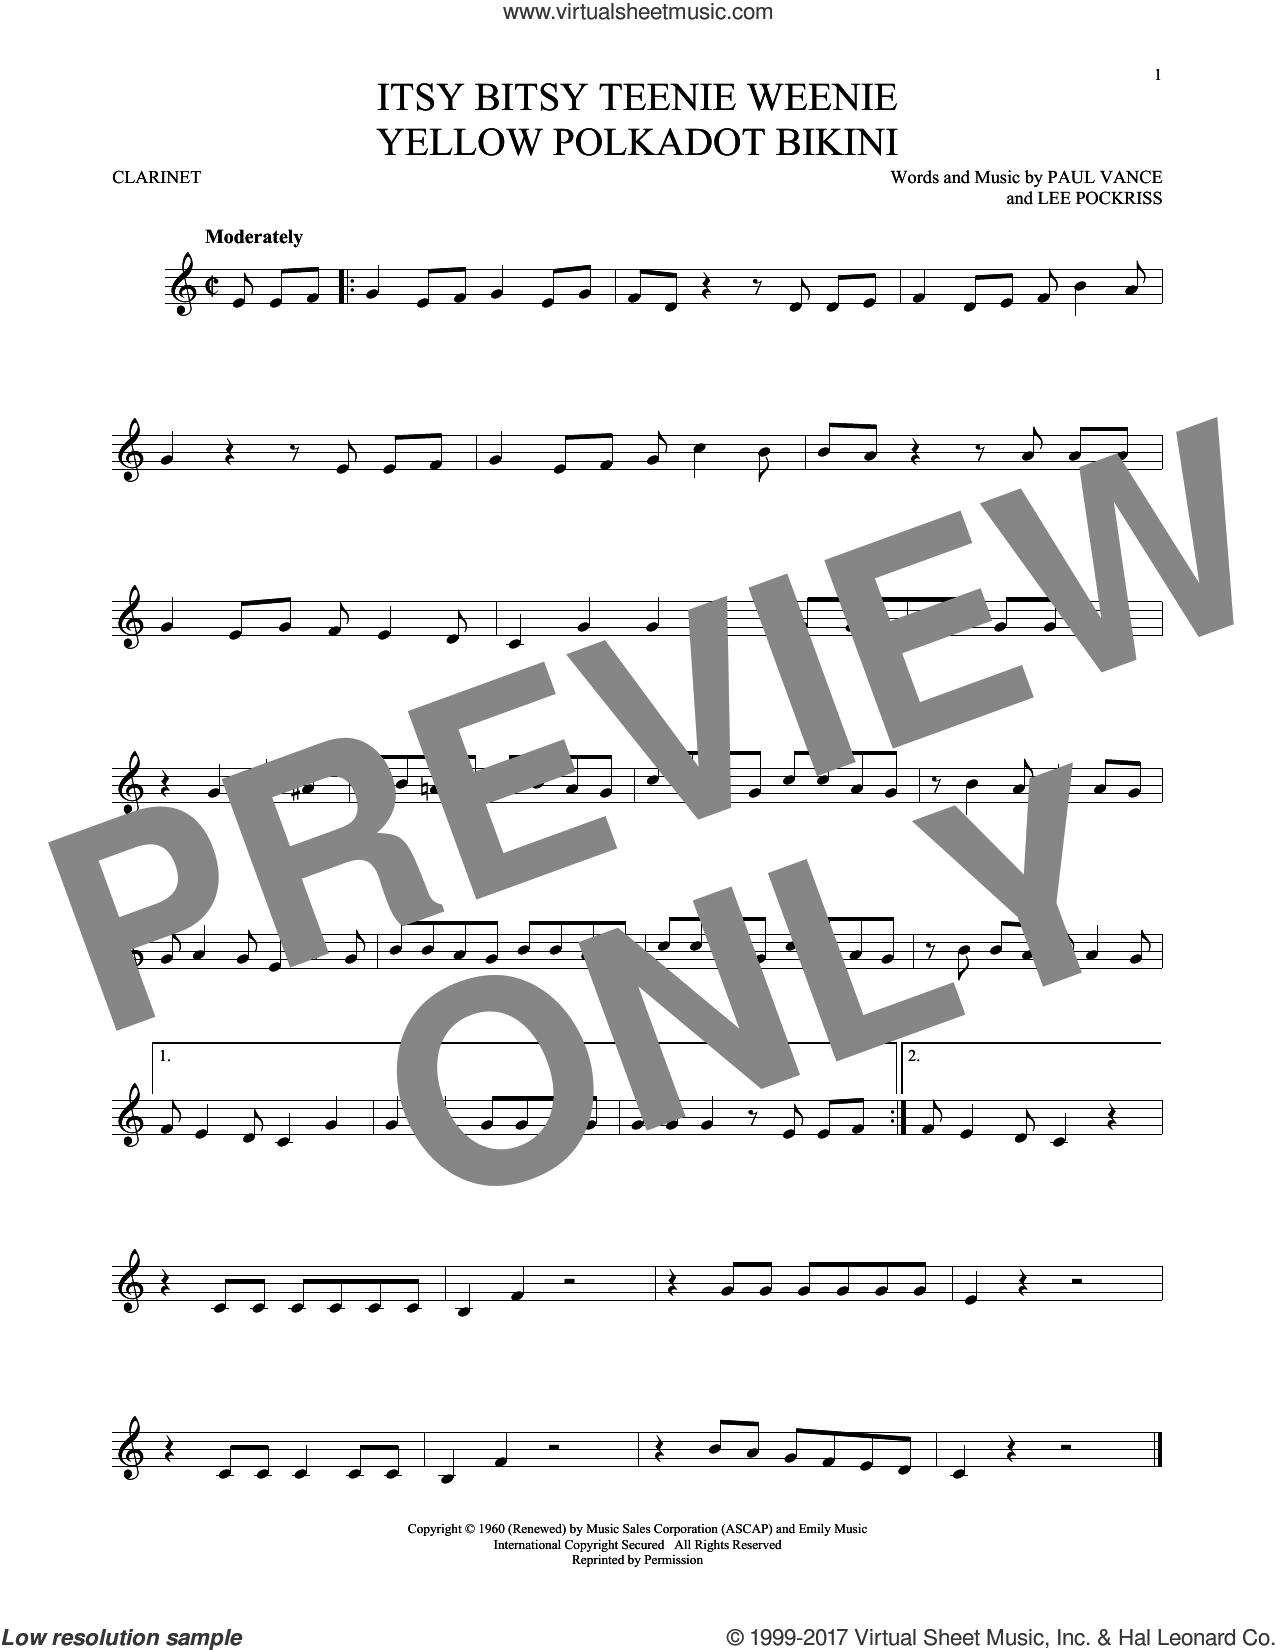 Itsy Bitsy Teenie Weenie Yellow Polkadot Bikini sheet music for clarinet solo by Brian Hyland, Lee Pockriss and Paul Vance, intermediate skill level